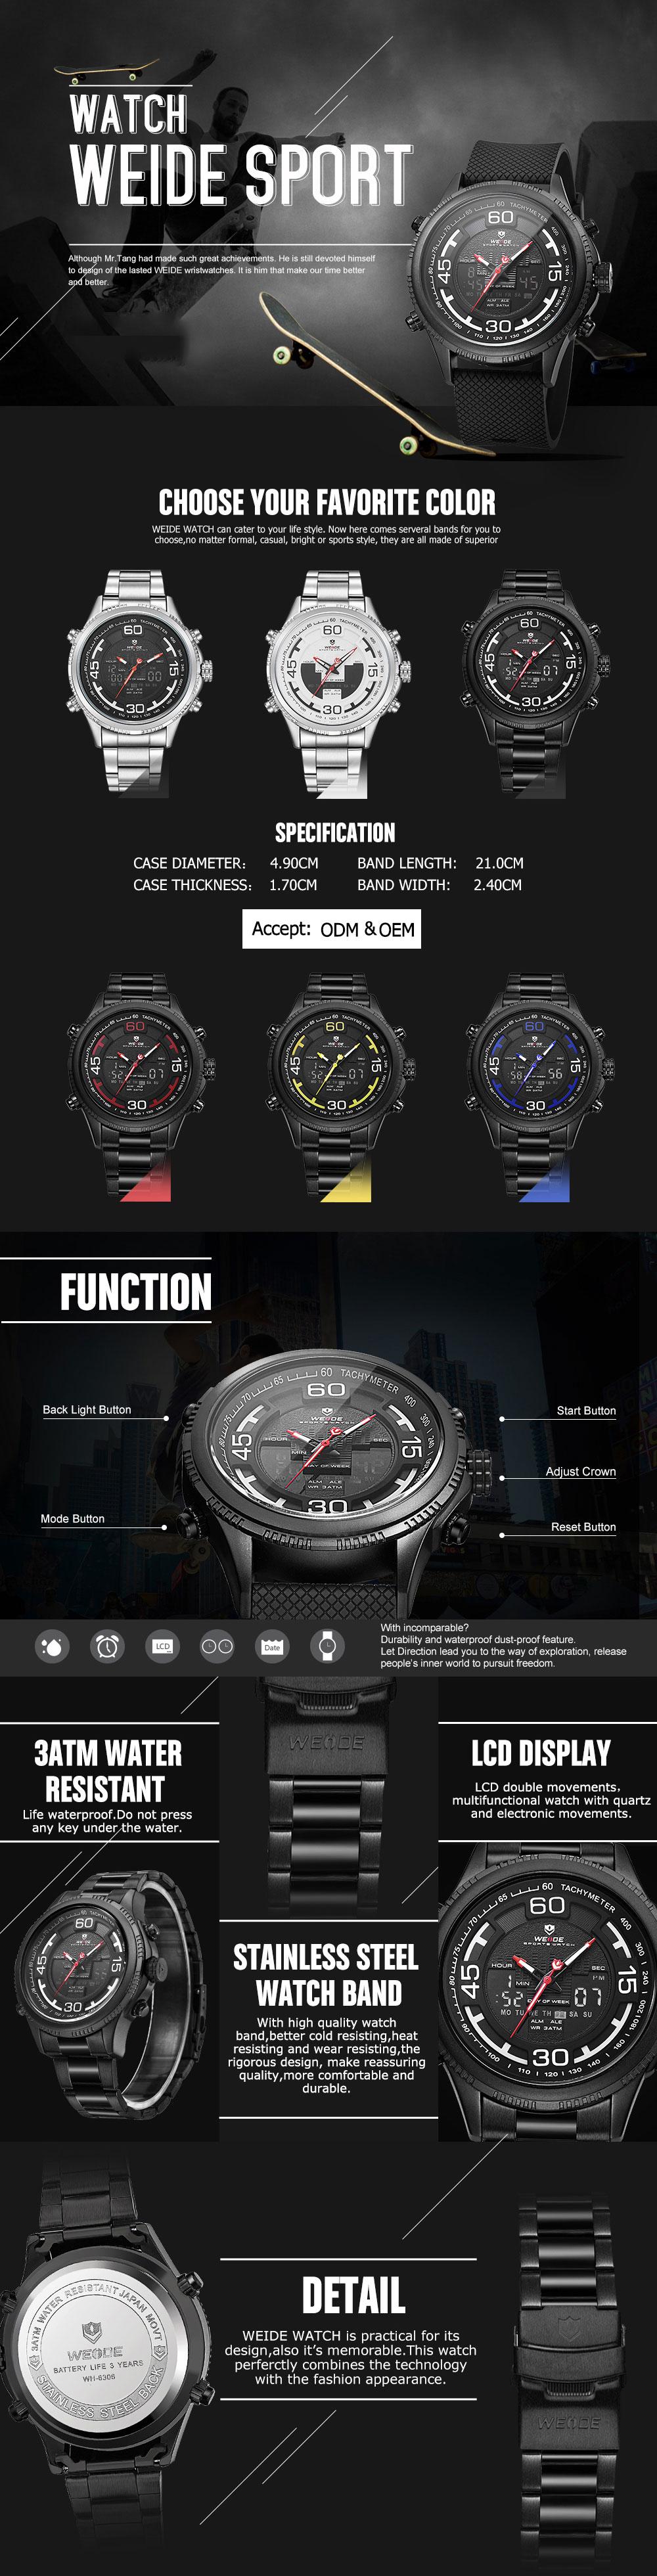 WEIDE 6306 Calendar Luminous Dual Display Digital Watch